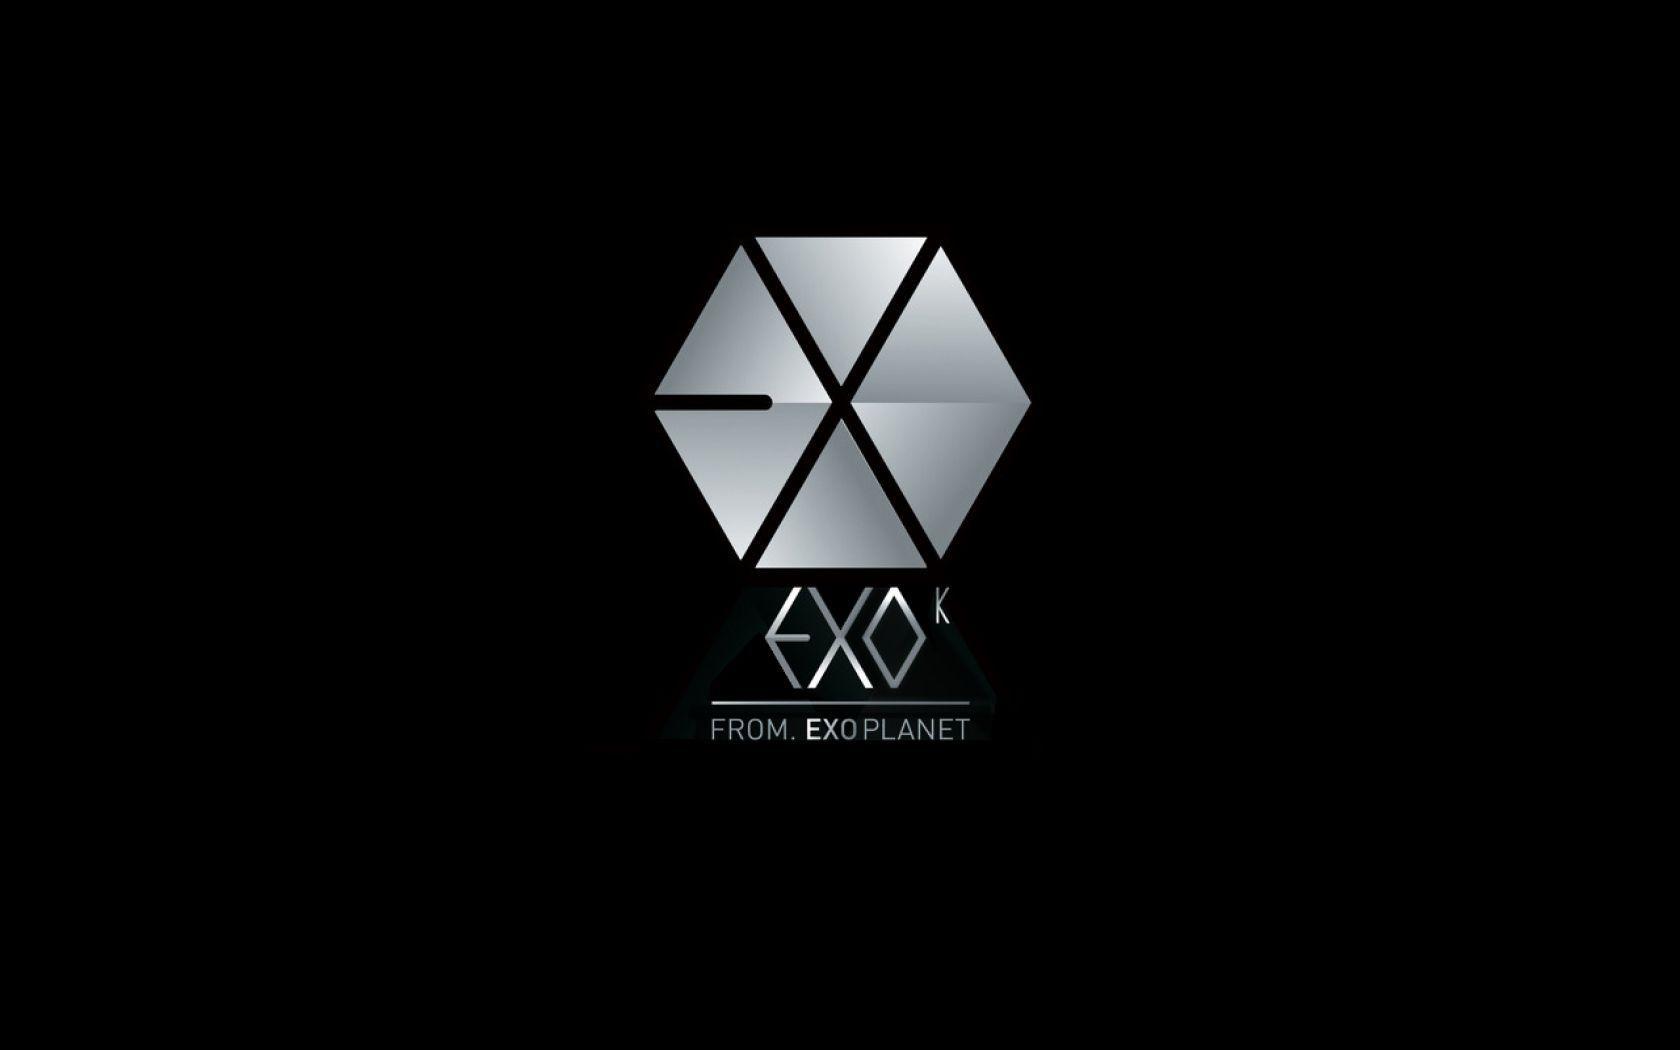 exo desktop wallpaper hd 2019